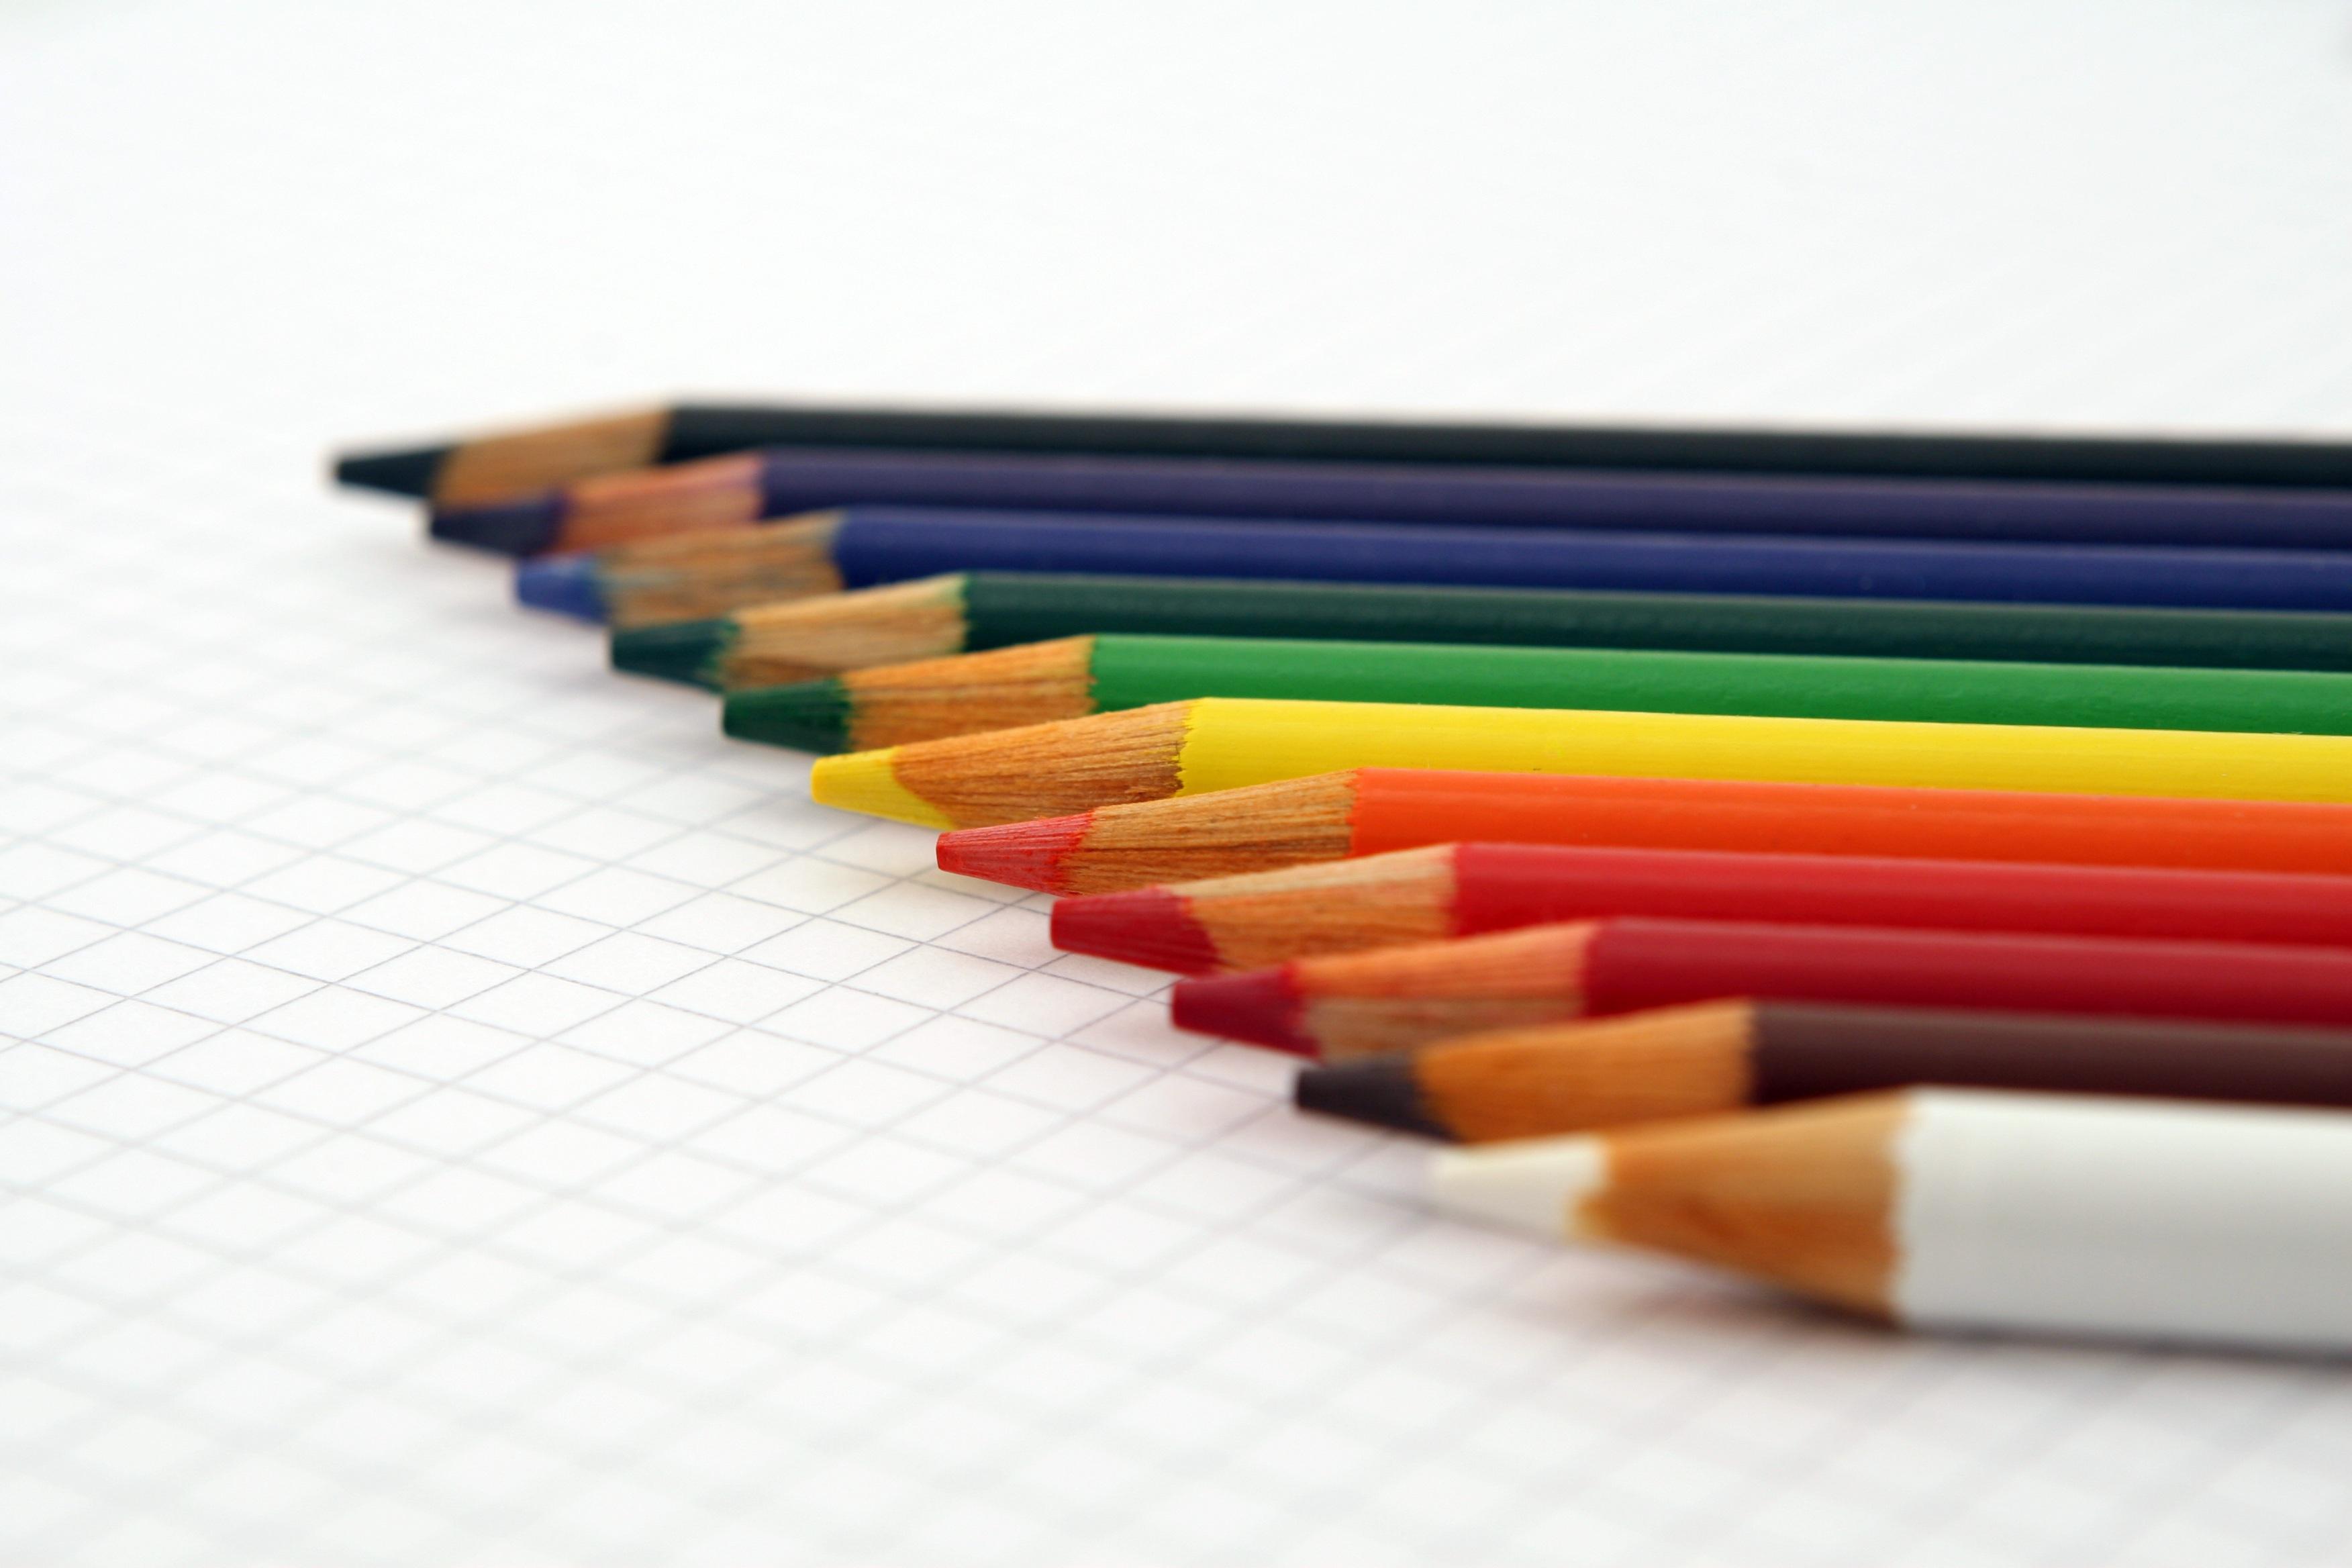 Color, Art, Idea, Pencil, Sketch, HQ Photo